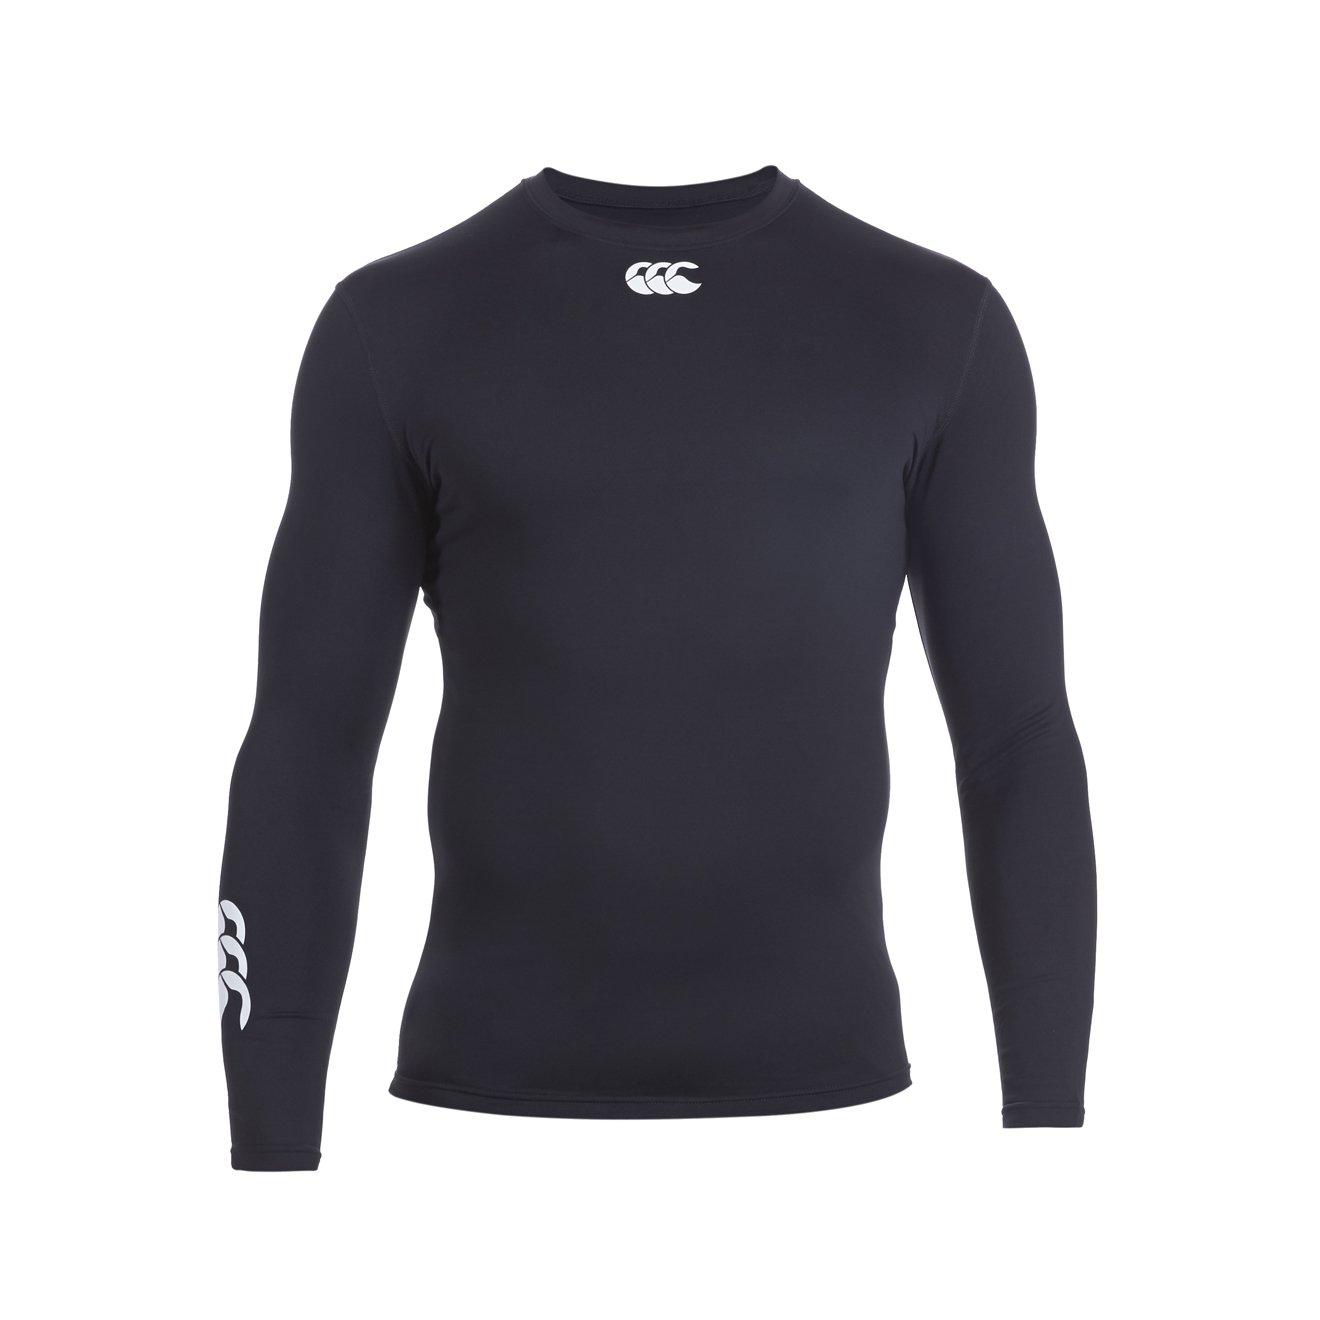 Canterbury of New Zealand Mens Long Sleeve Cold Baselayer Shirt Black E542640